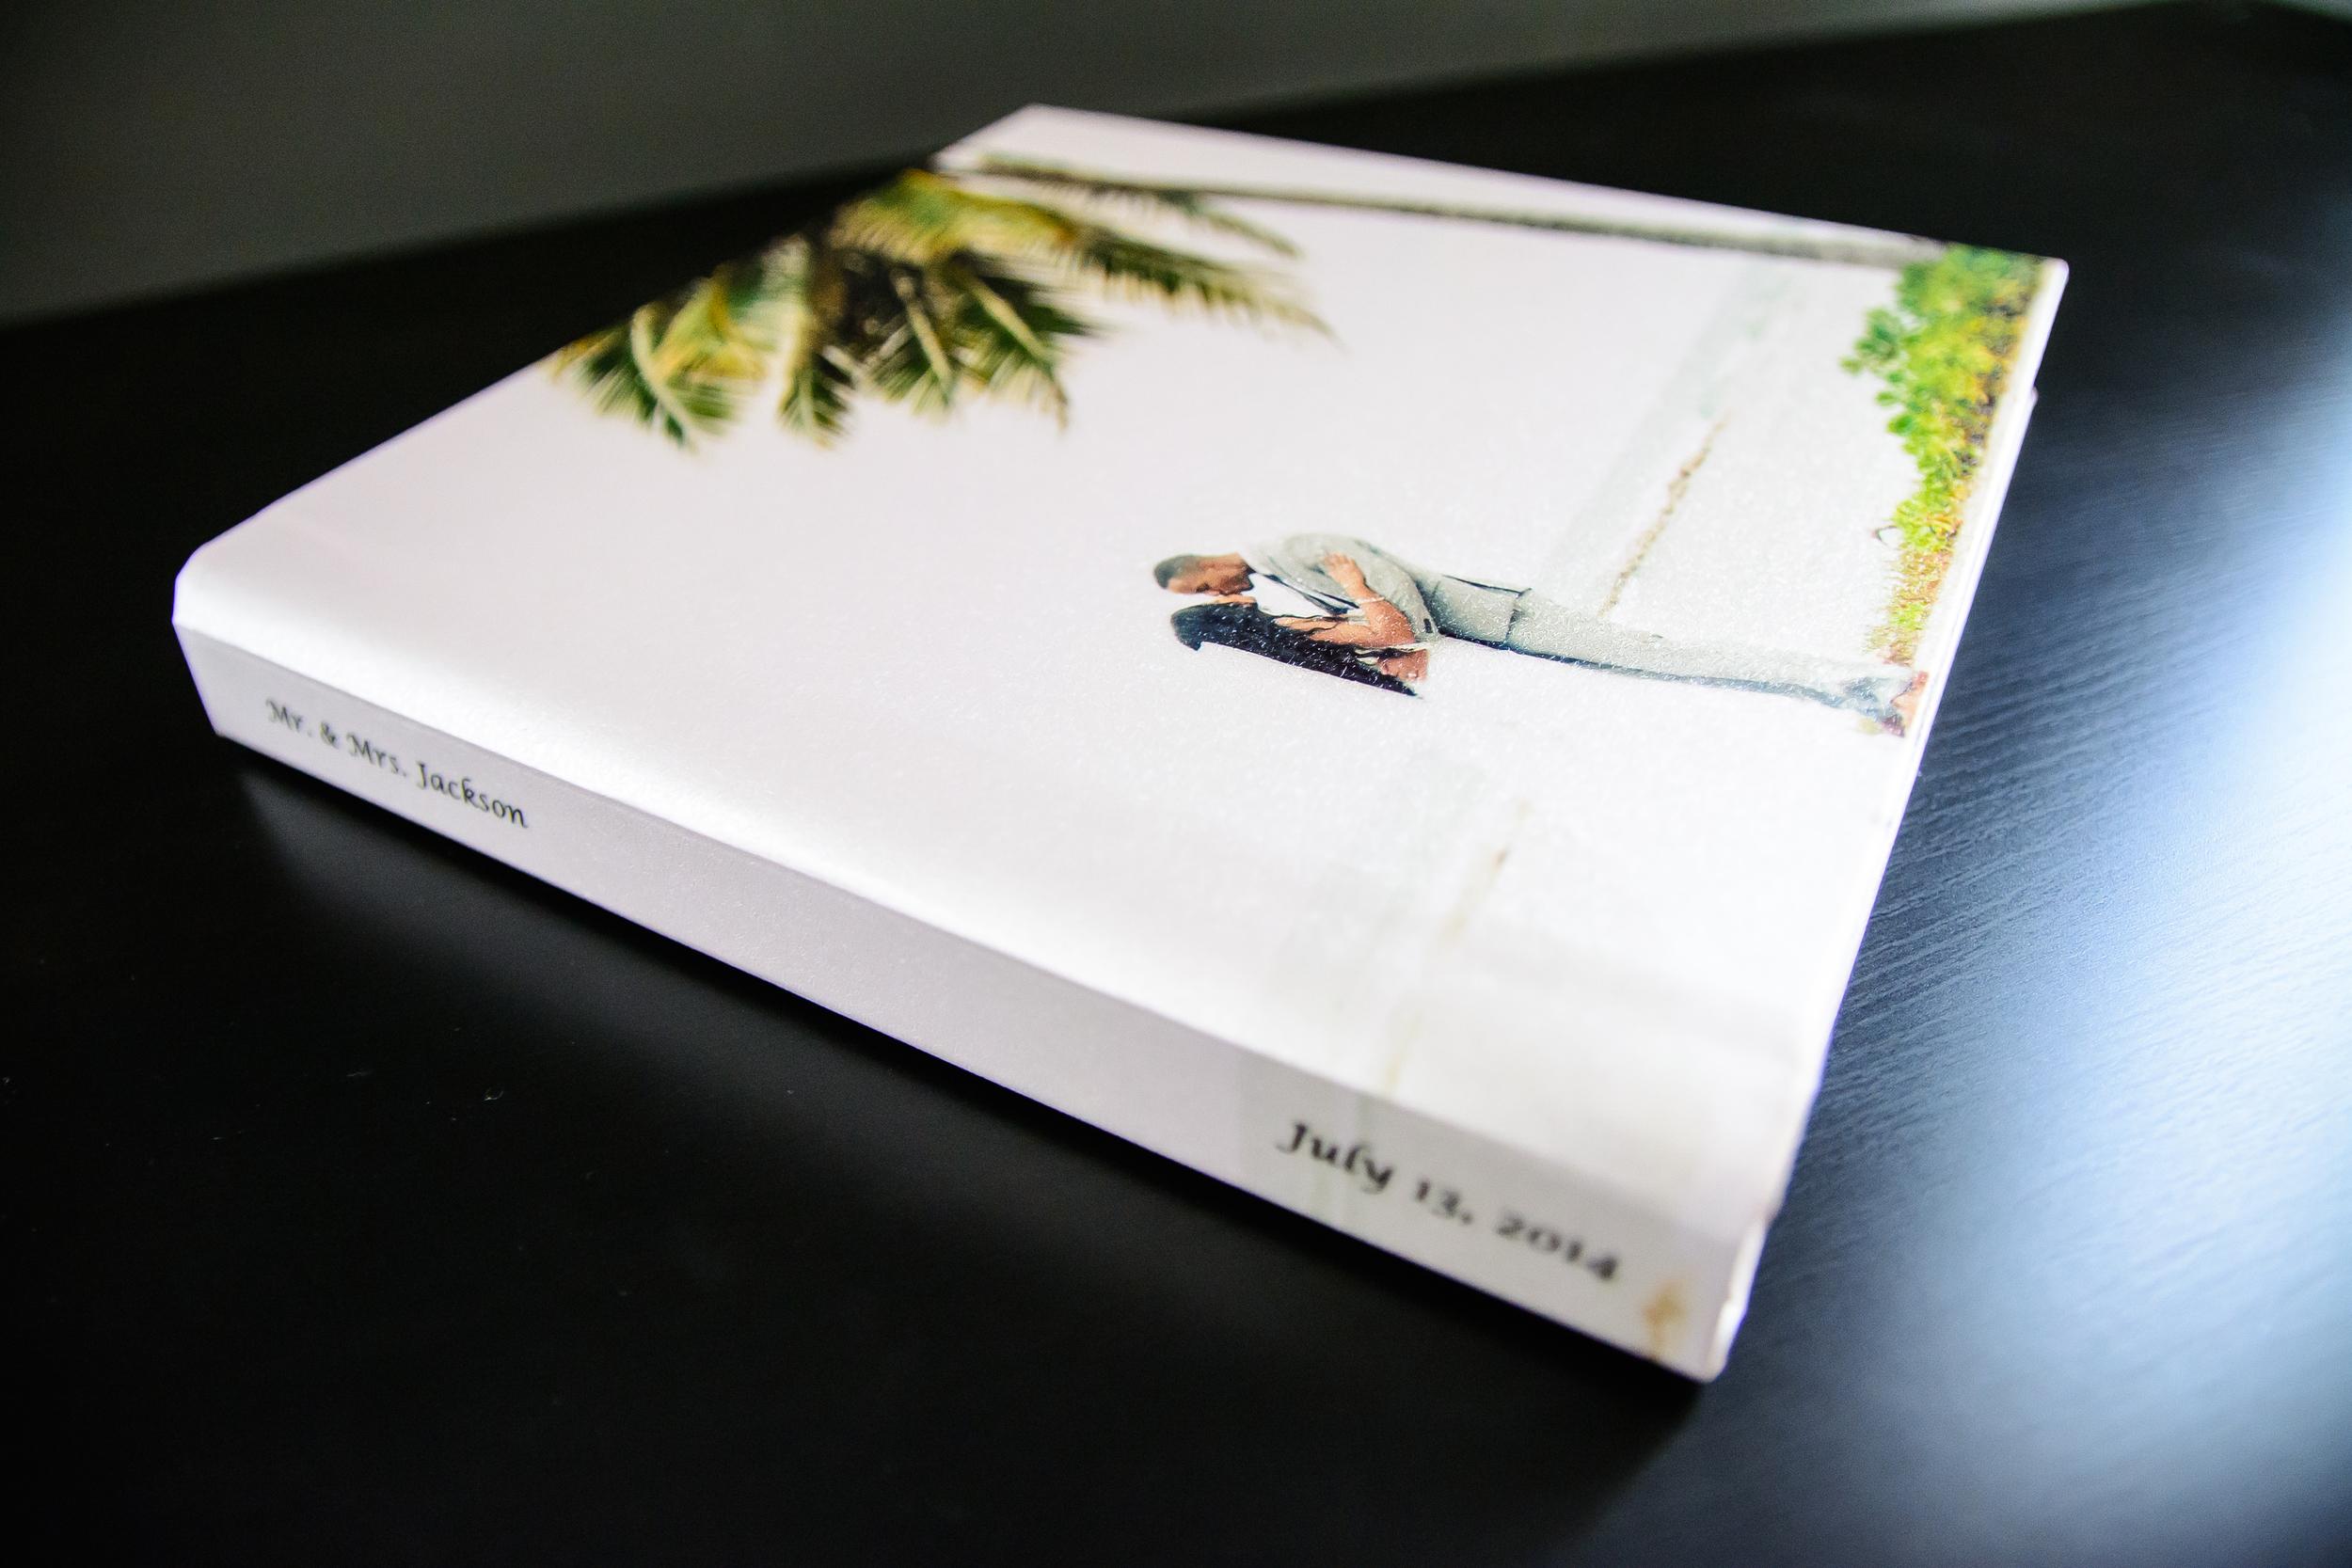 eyeobee -The ART Book- Testimonials